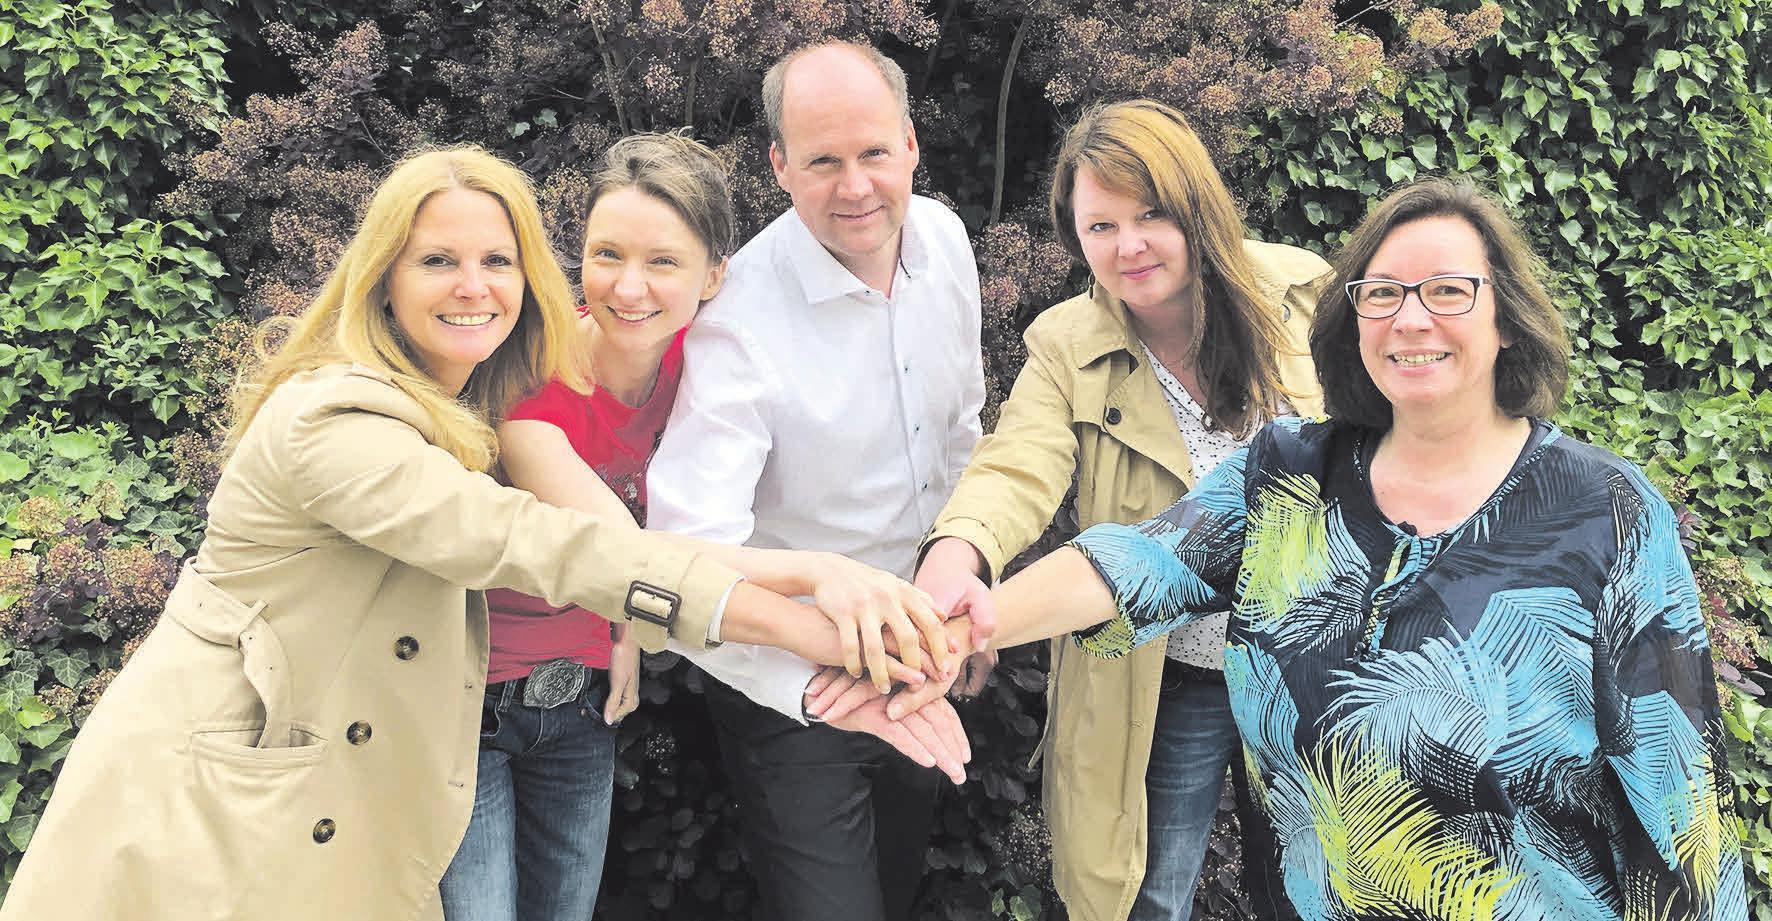 Für die WAZ bewegen sich (v. l.): Silke Kalmbacher, Katarzyna Warzynska, Gordon Firl, Franziska Jackowicz und Martina Ganz. Foto: privat